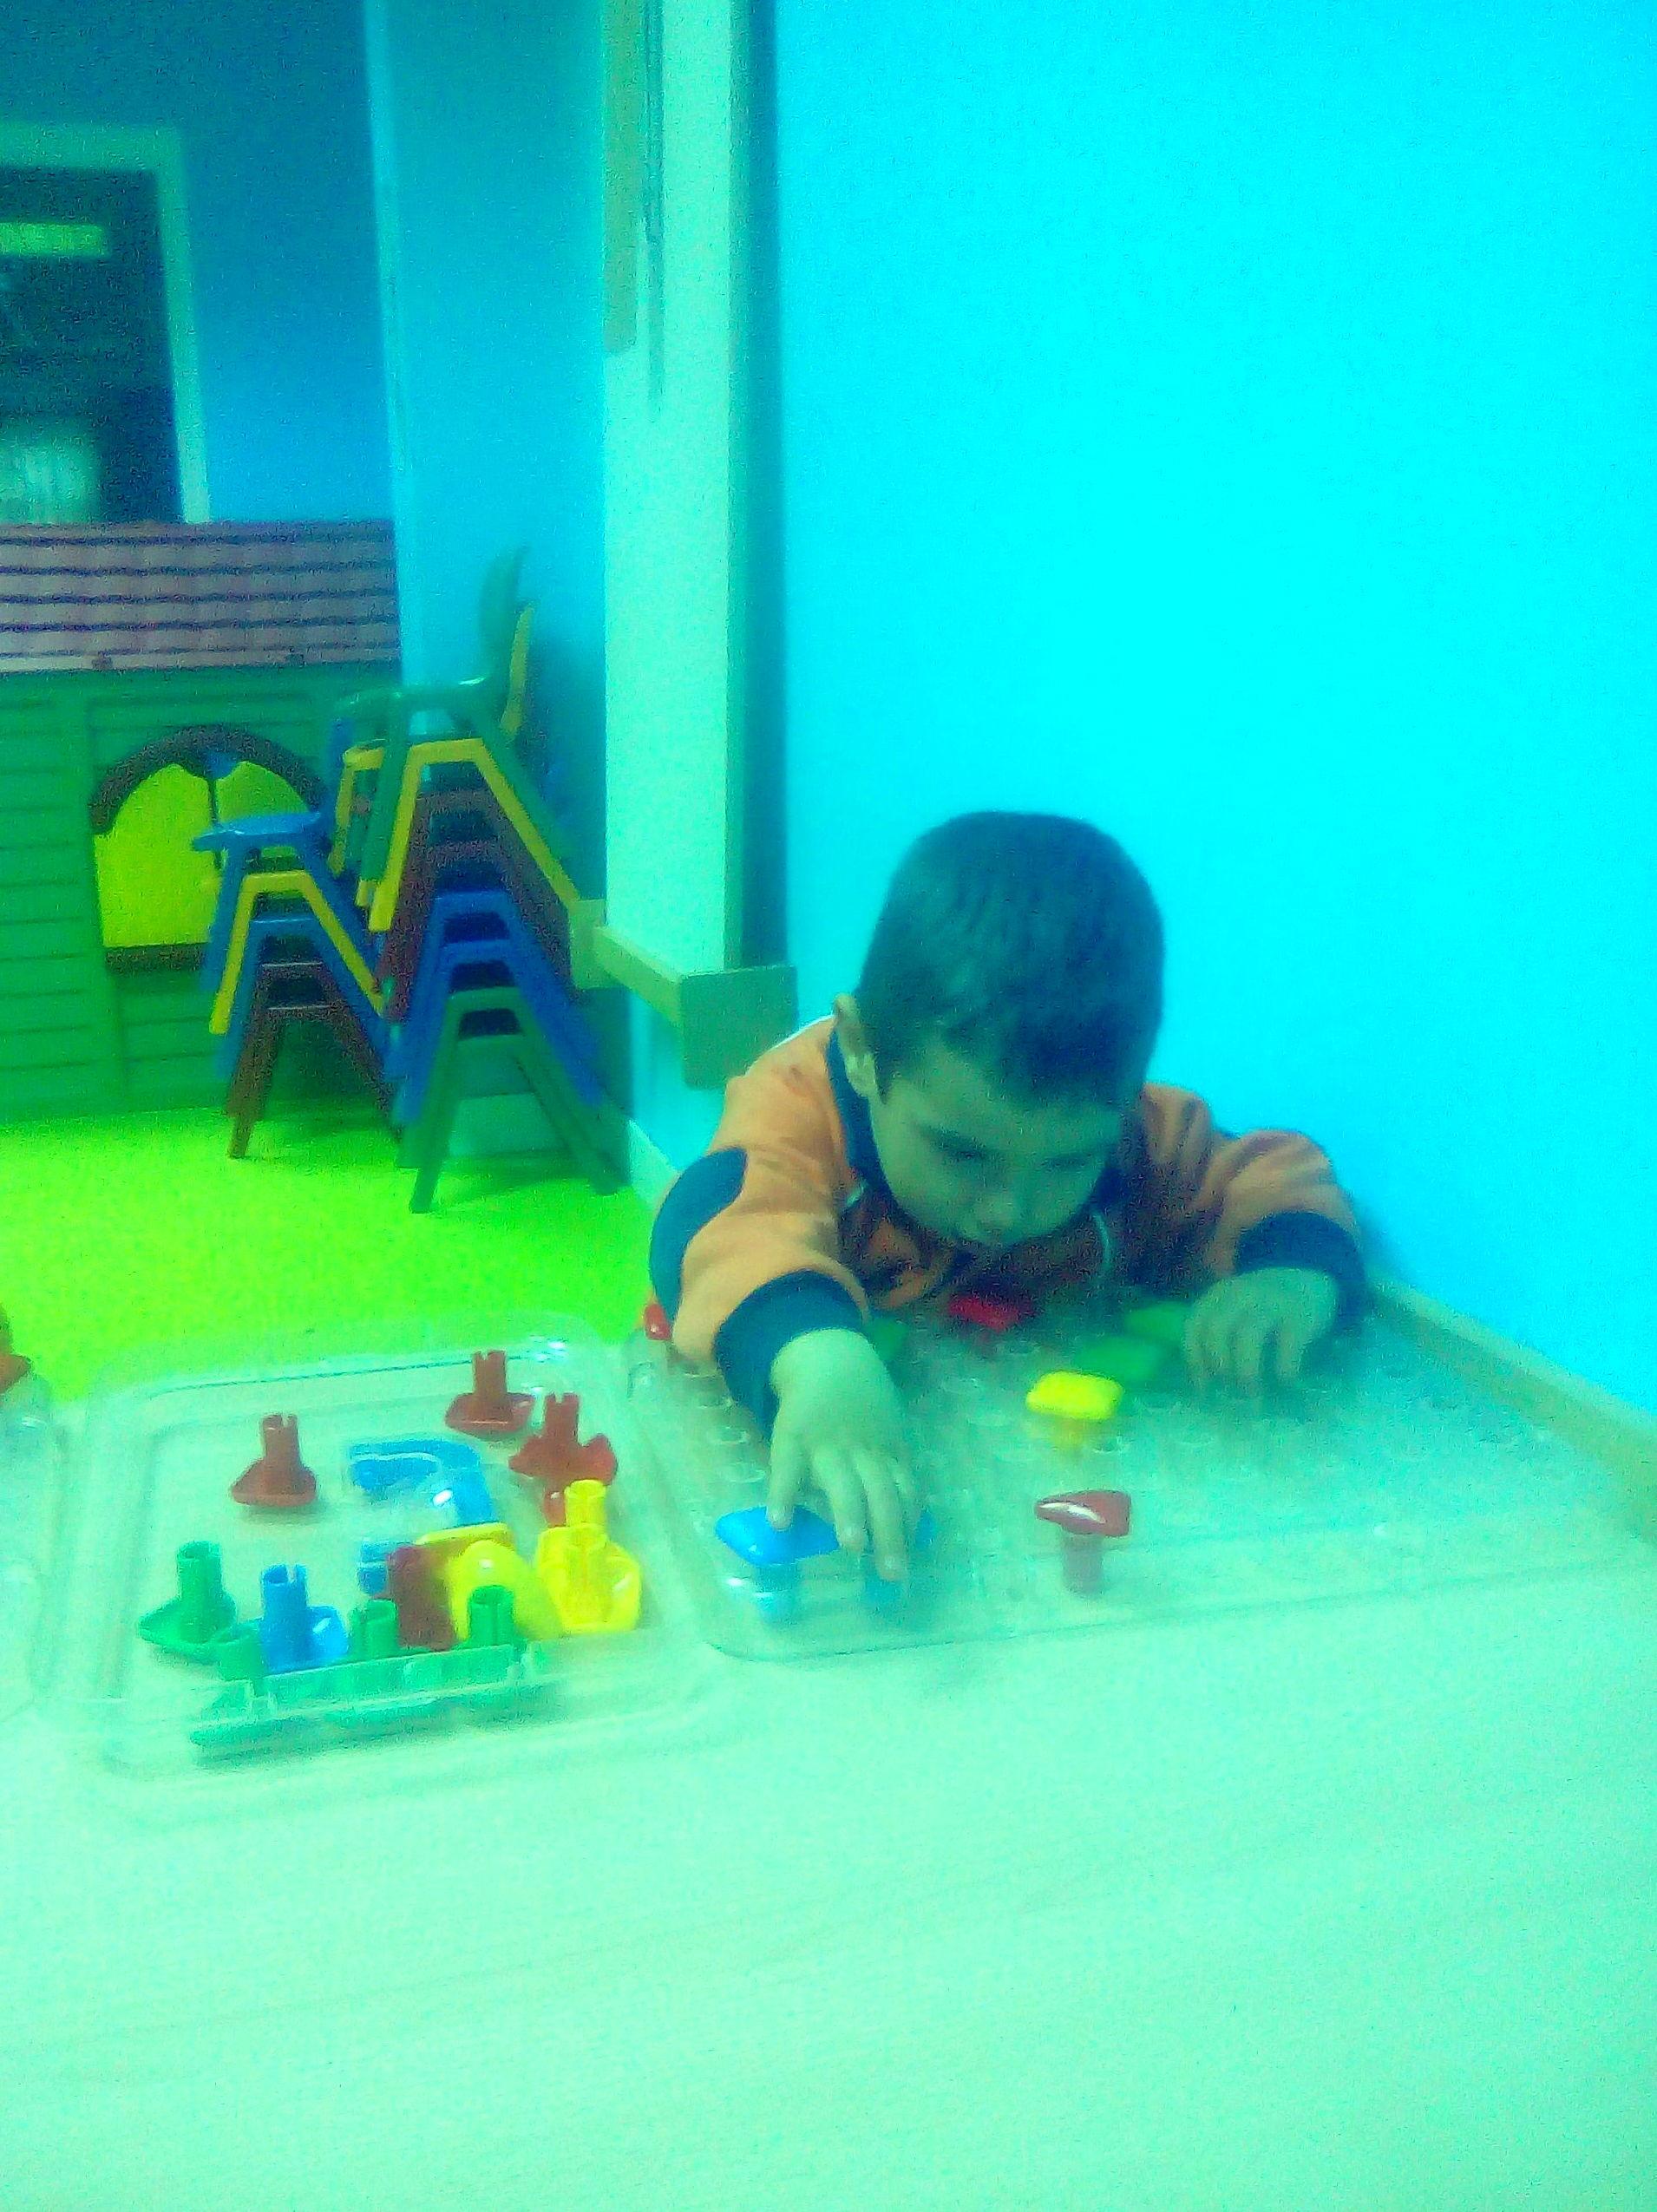 Foto 5 de Escuela infantil en Algete | E.I. Cuatro Pecas de Colores